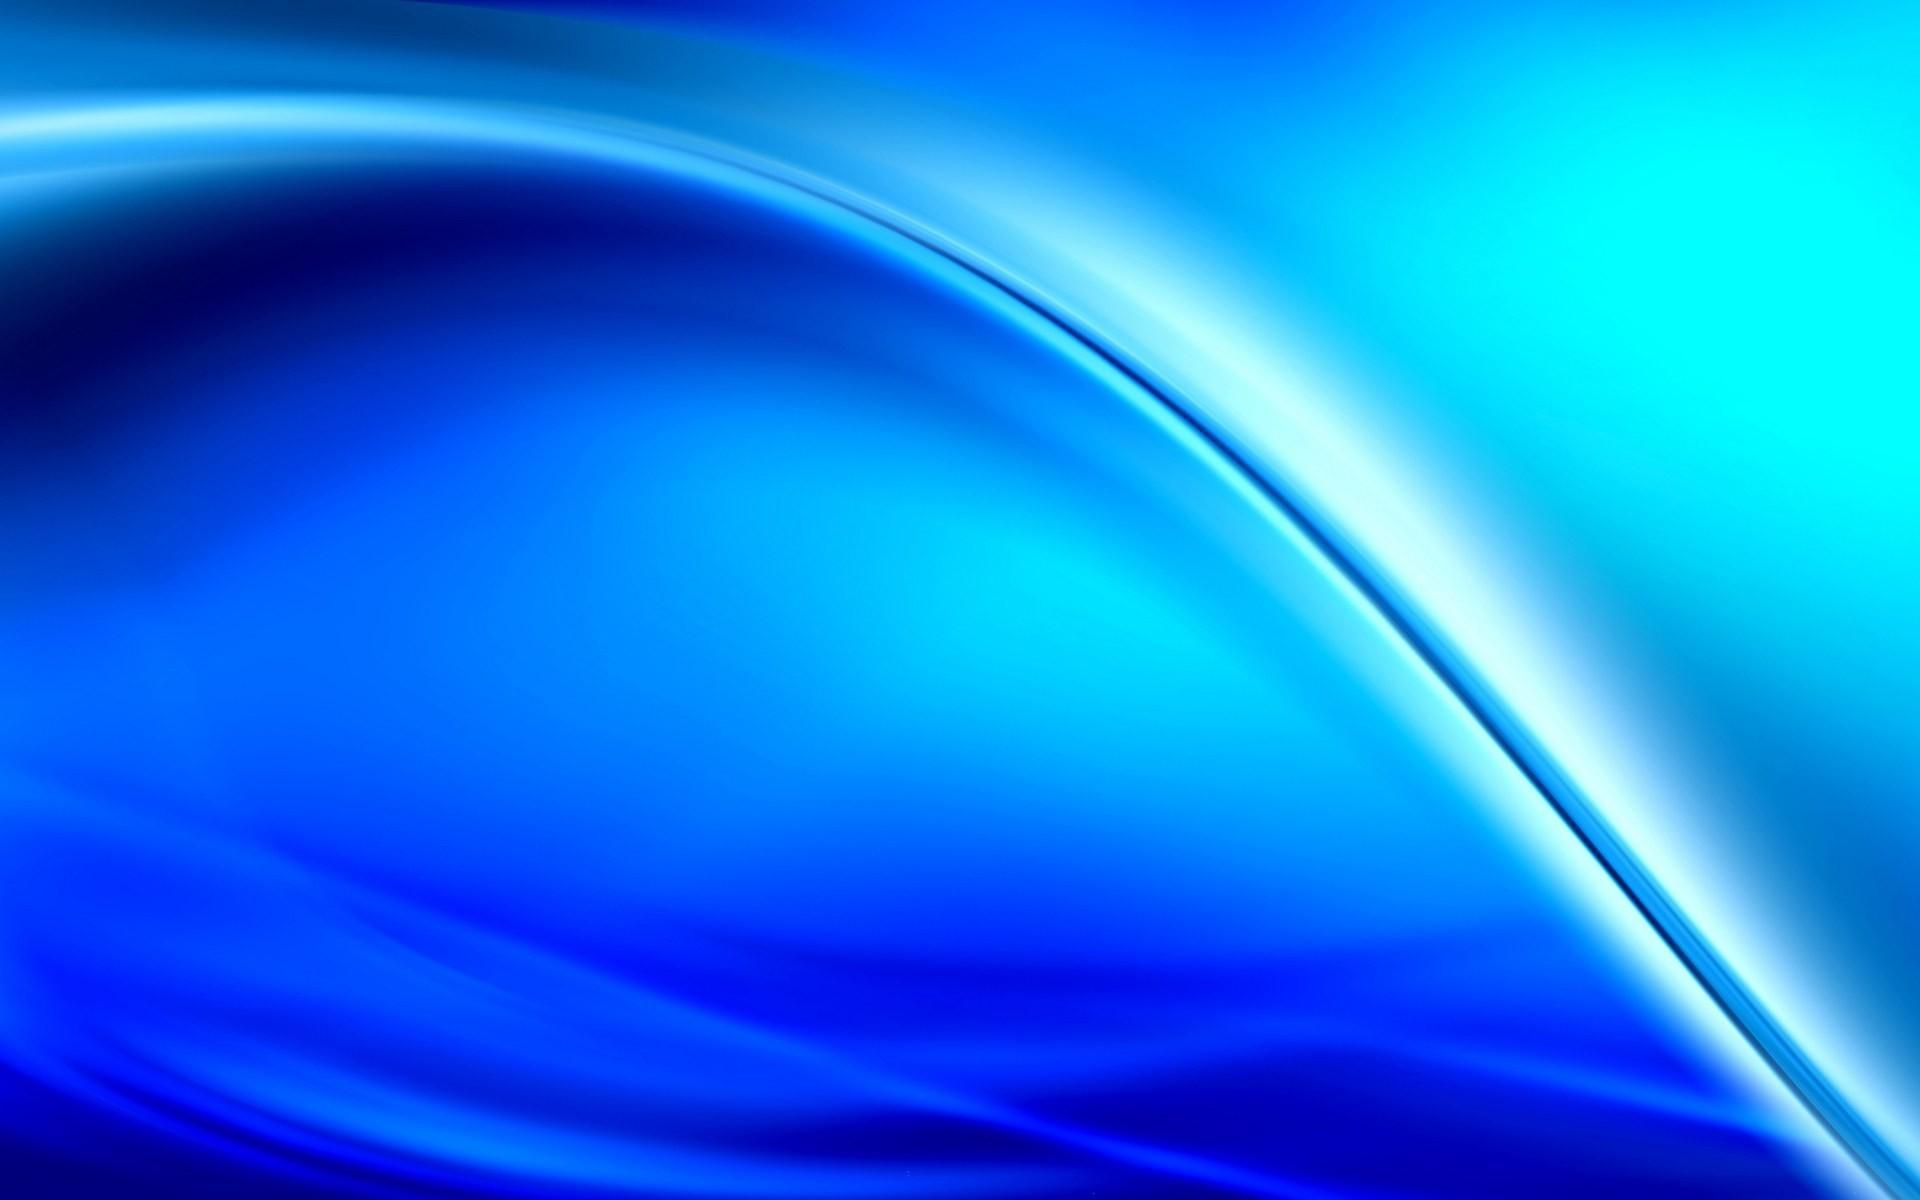 Bright Blue 3D Abstract Wallpaper | HD Wallpaper